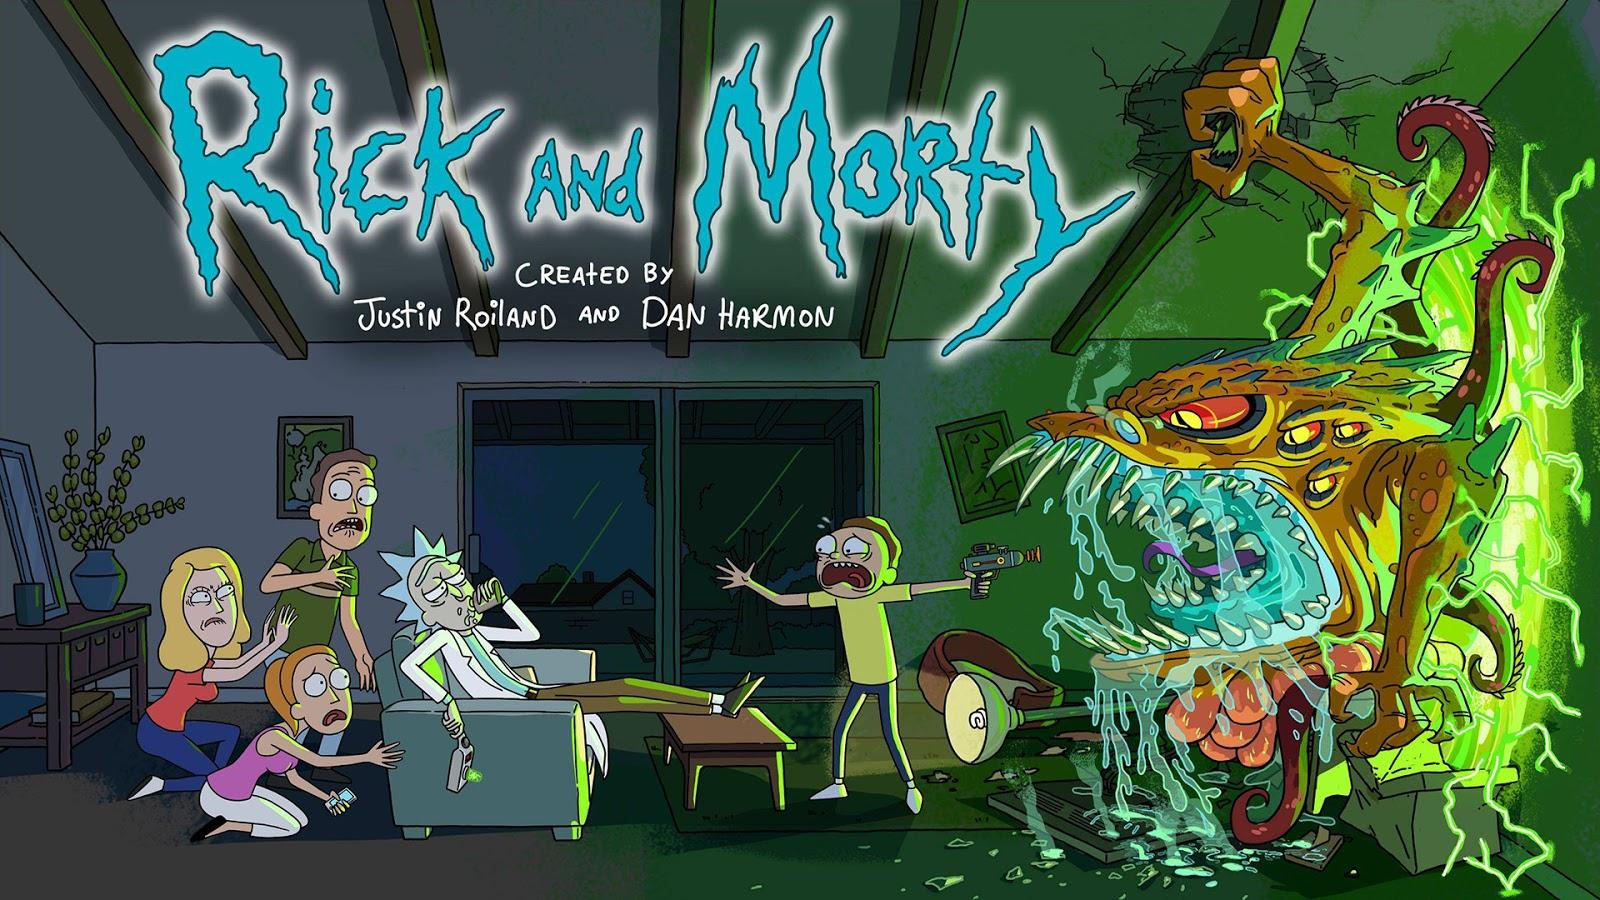 Rick and morty season 3 episode 6 1080p | Rick and Morty